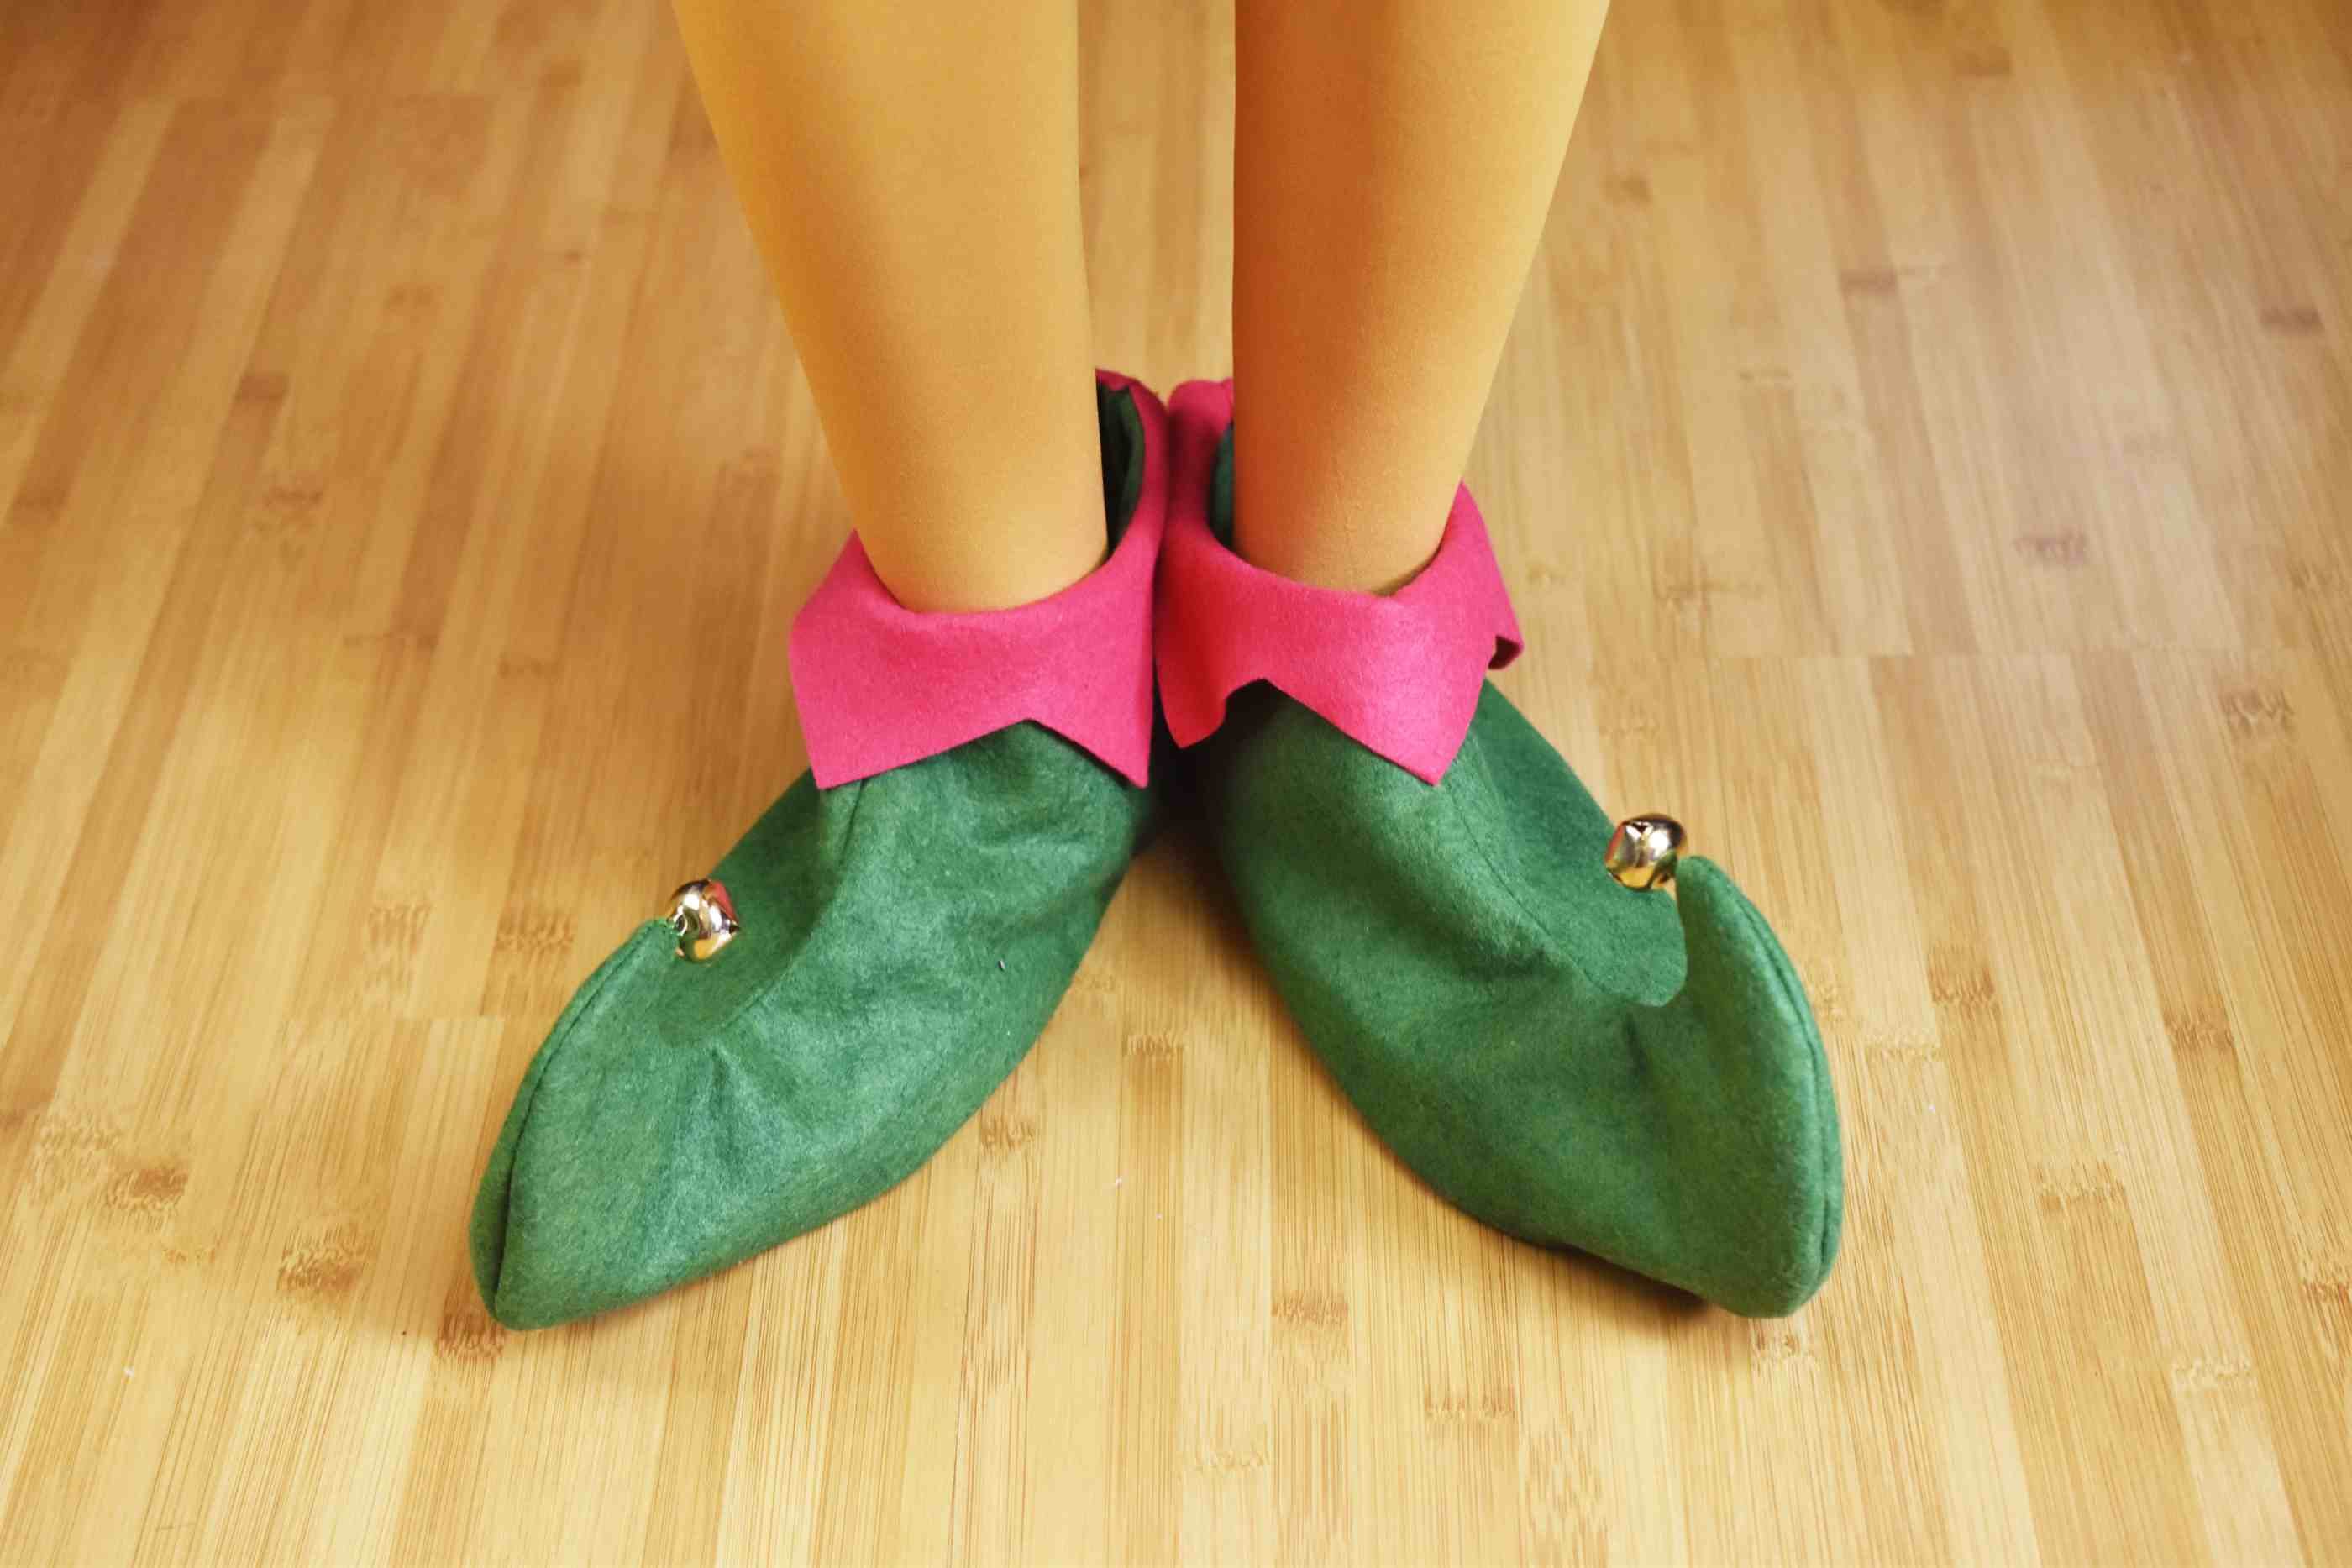 d0b1542e55f5a How to Sew Felt Elf Shoes